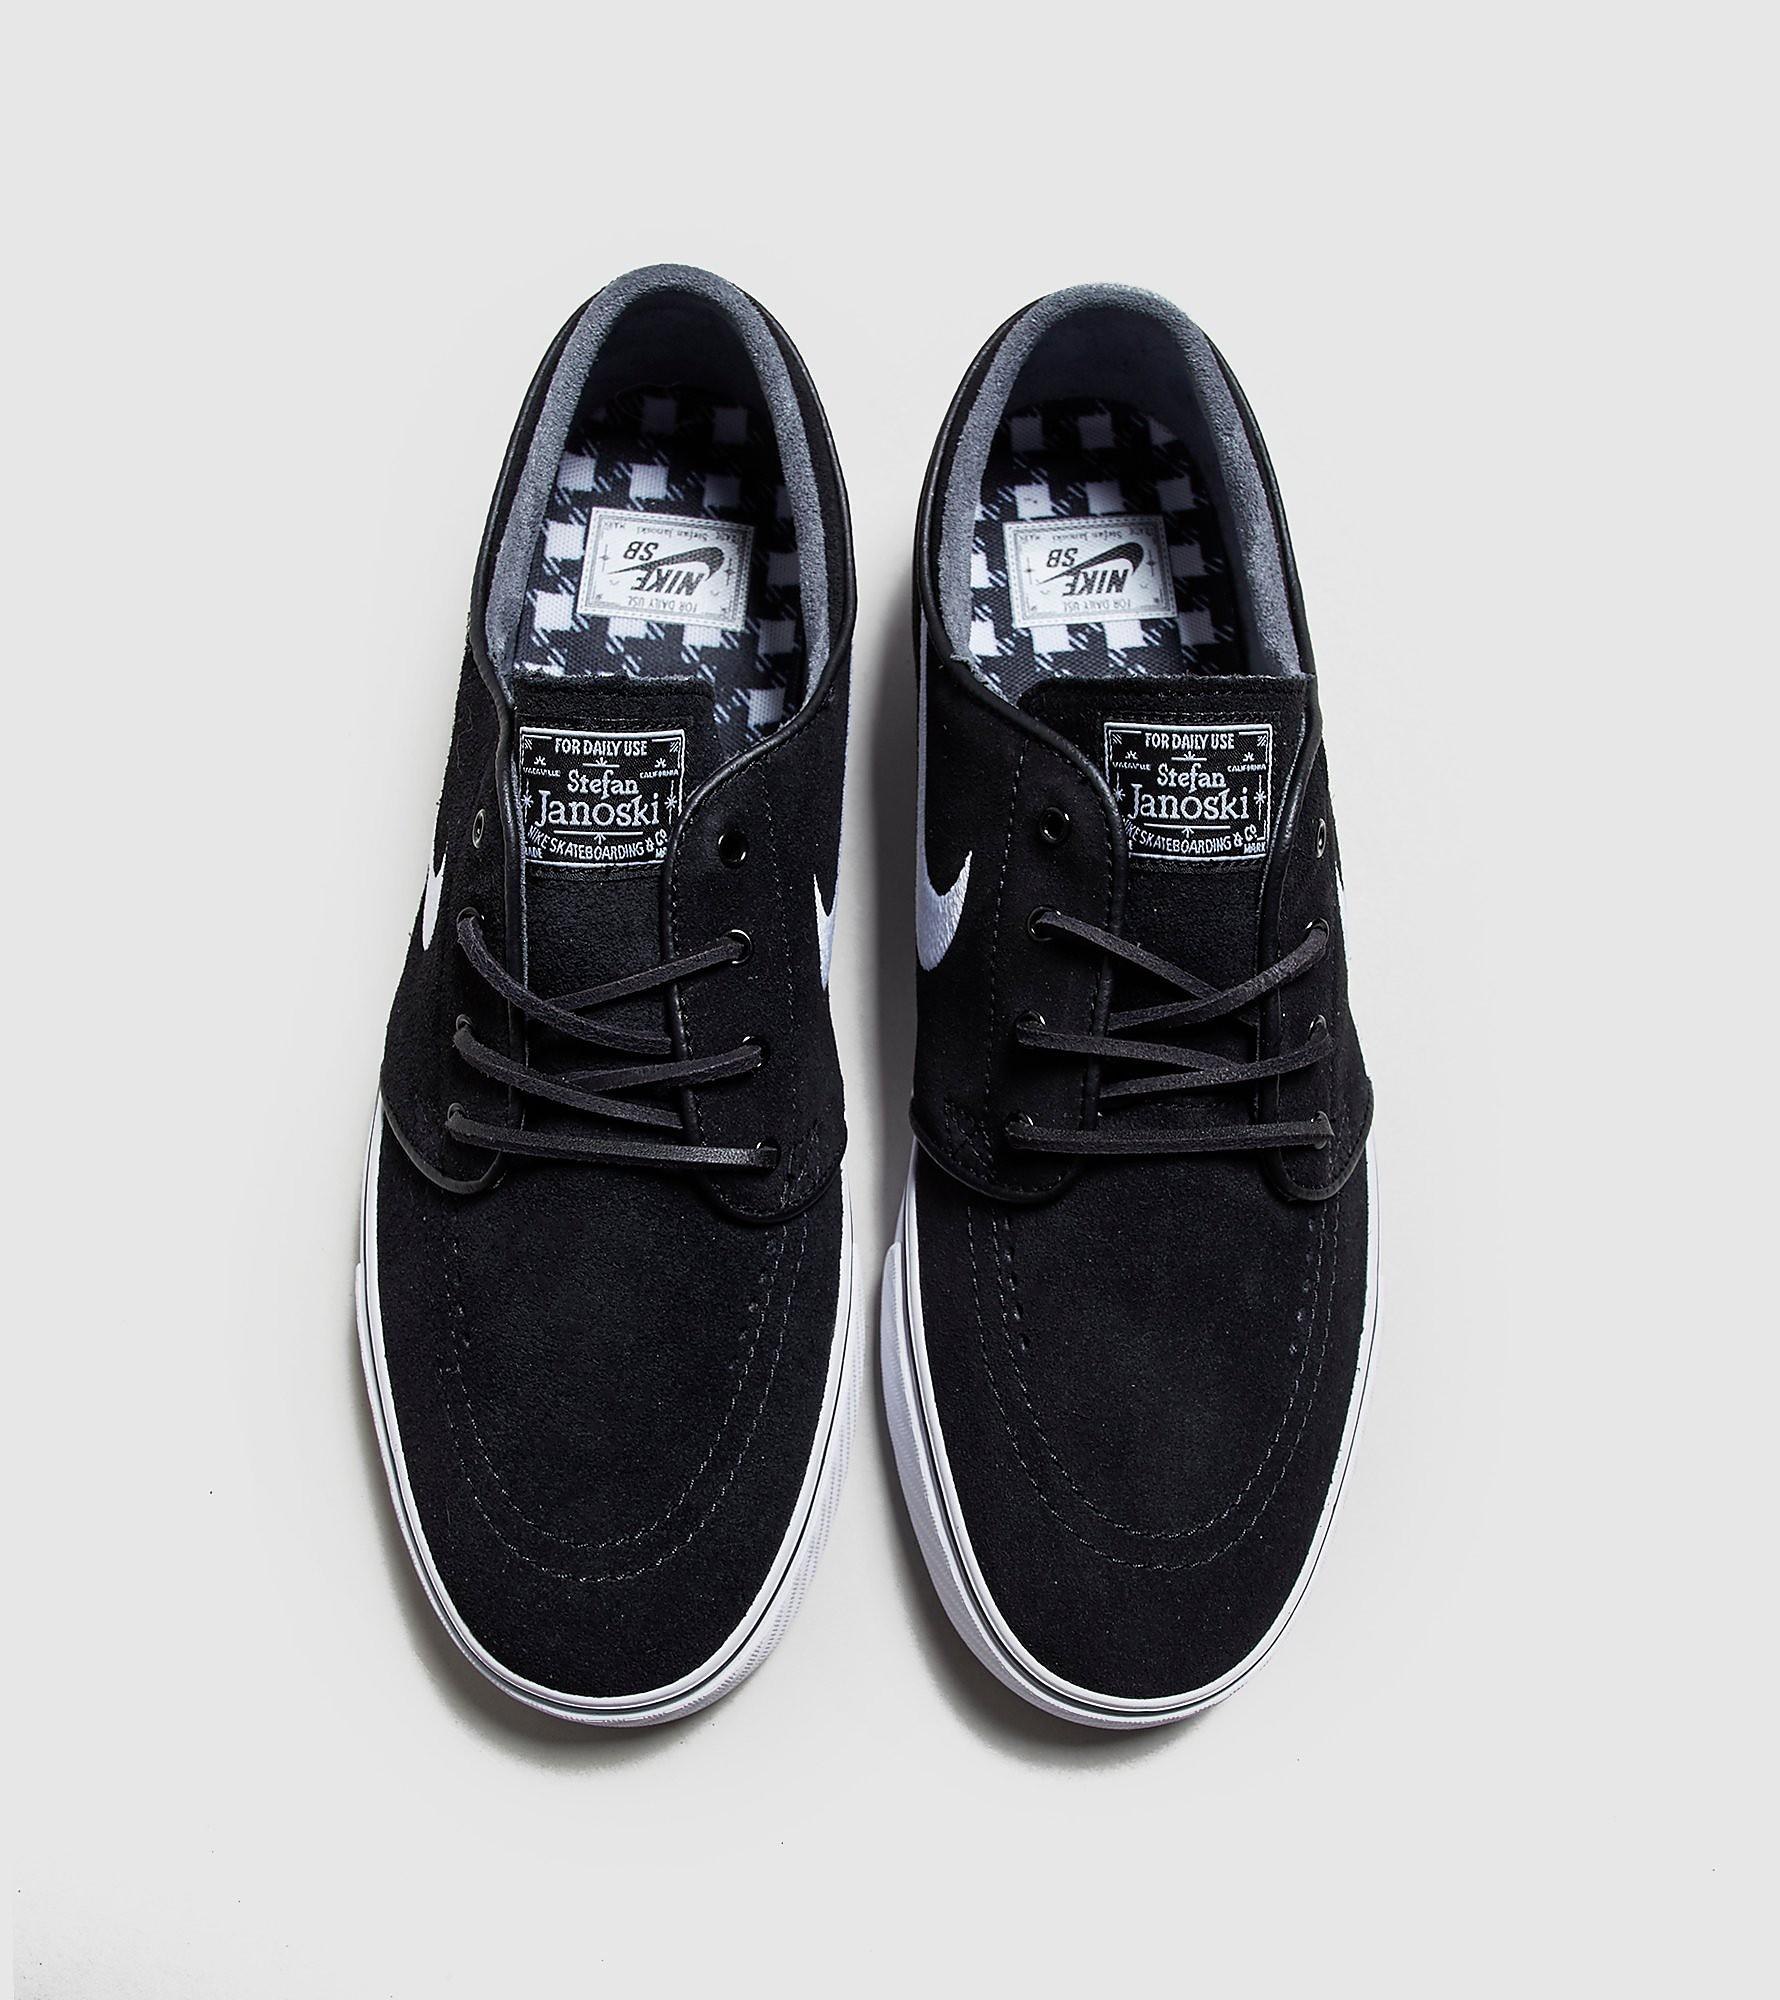 Zoom Stefan Janoski Nike de Ante de color Negro para hombre